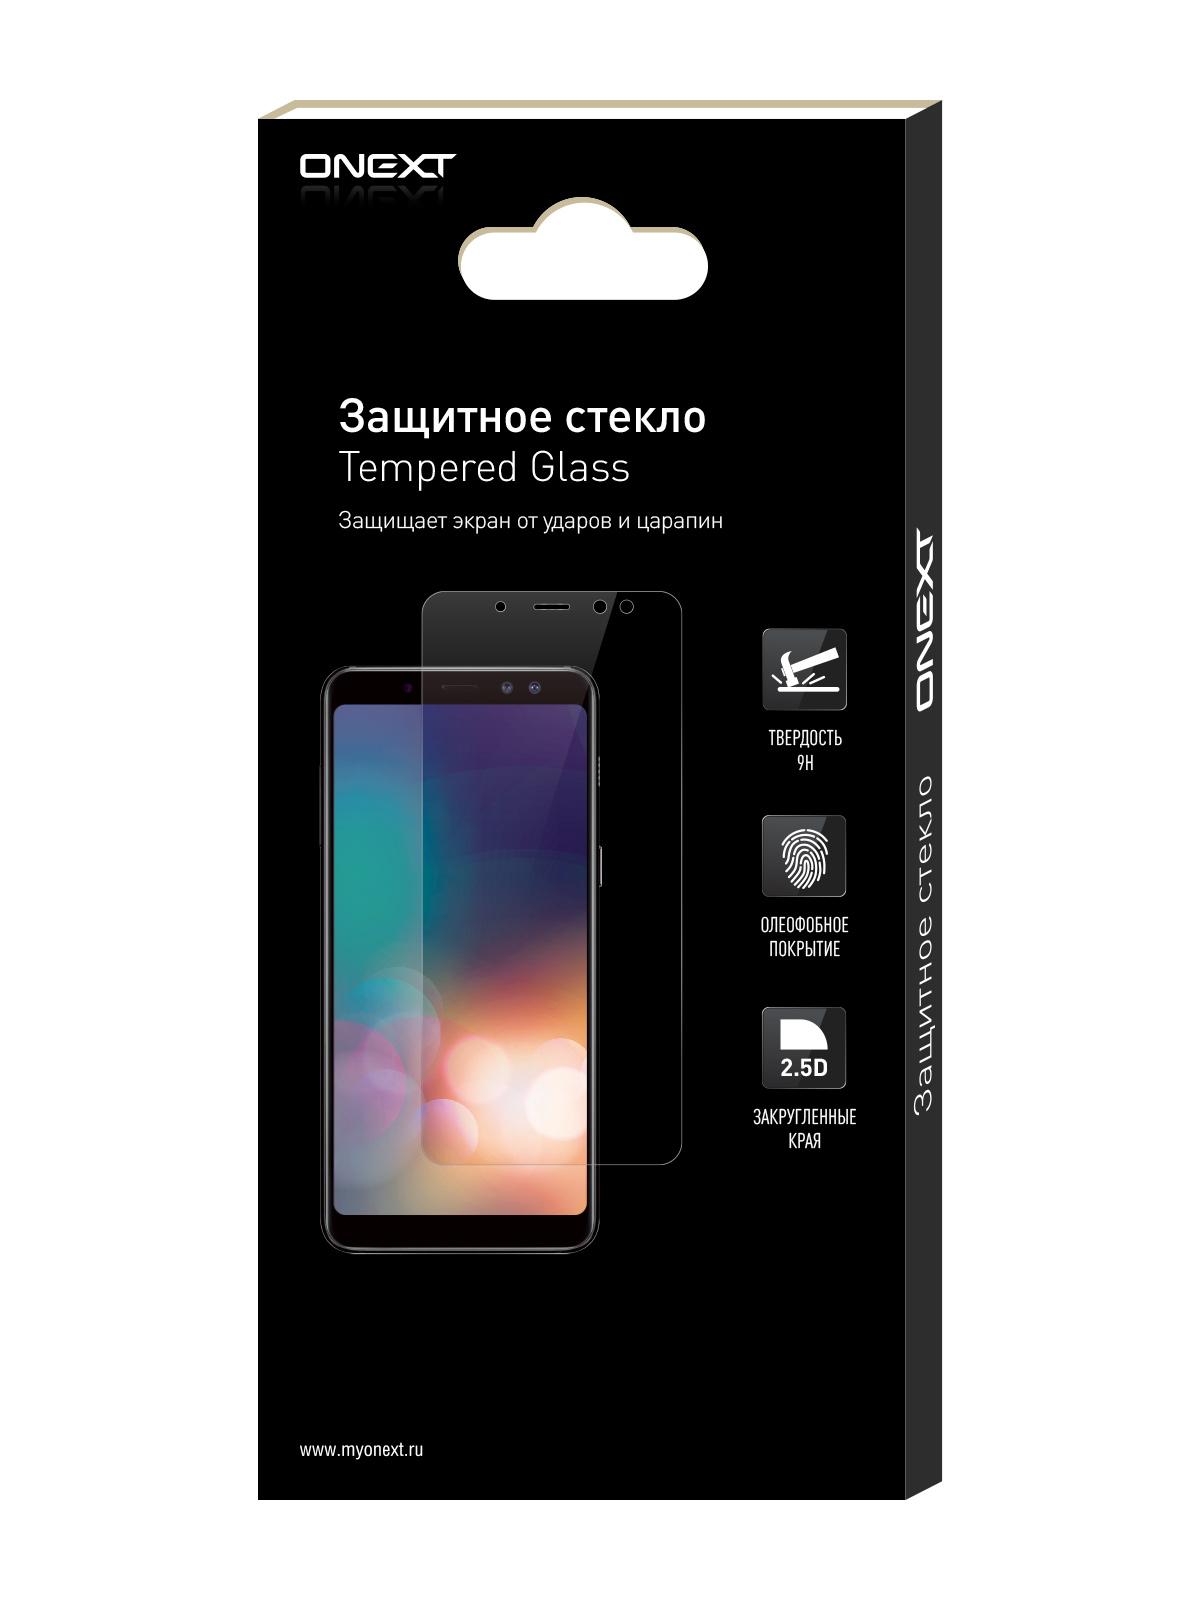 Защитное стекло ONEXT HTC Desire 526/526G+ защитное стекло для htc desire 628 onext